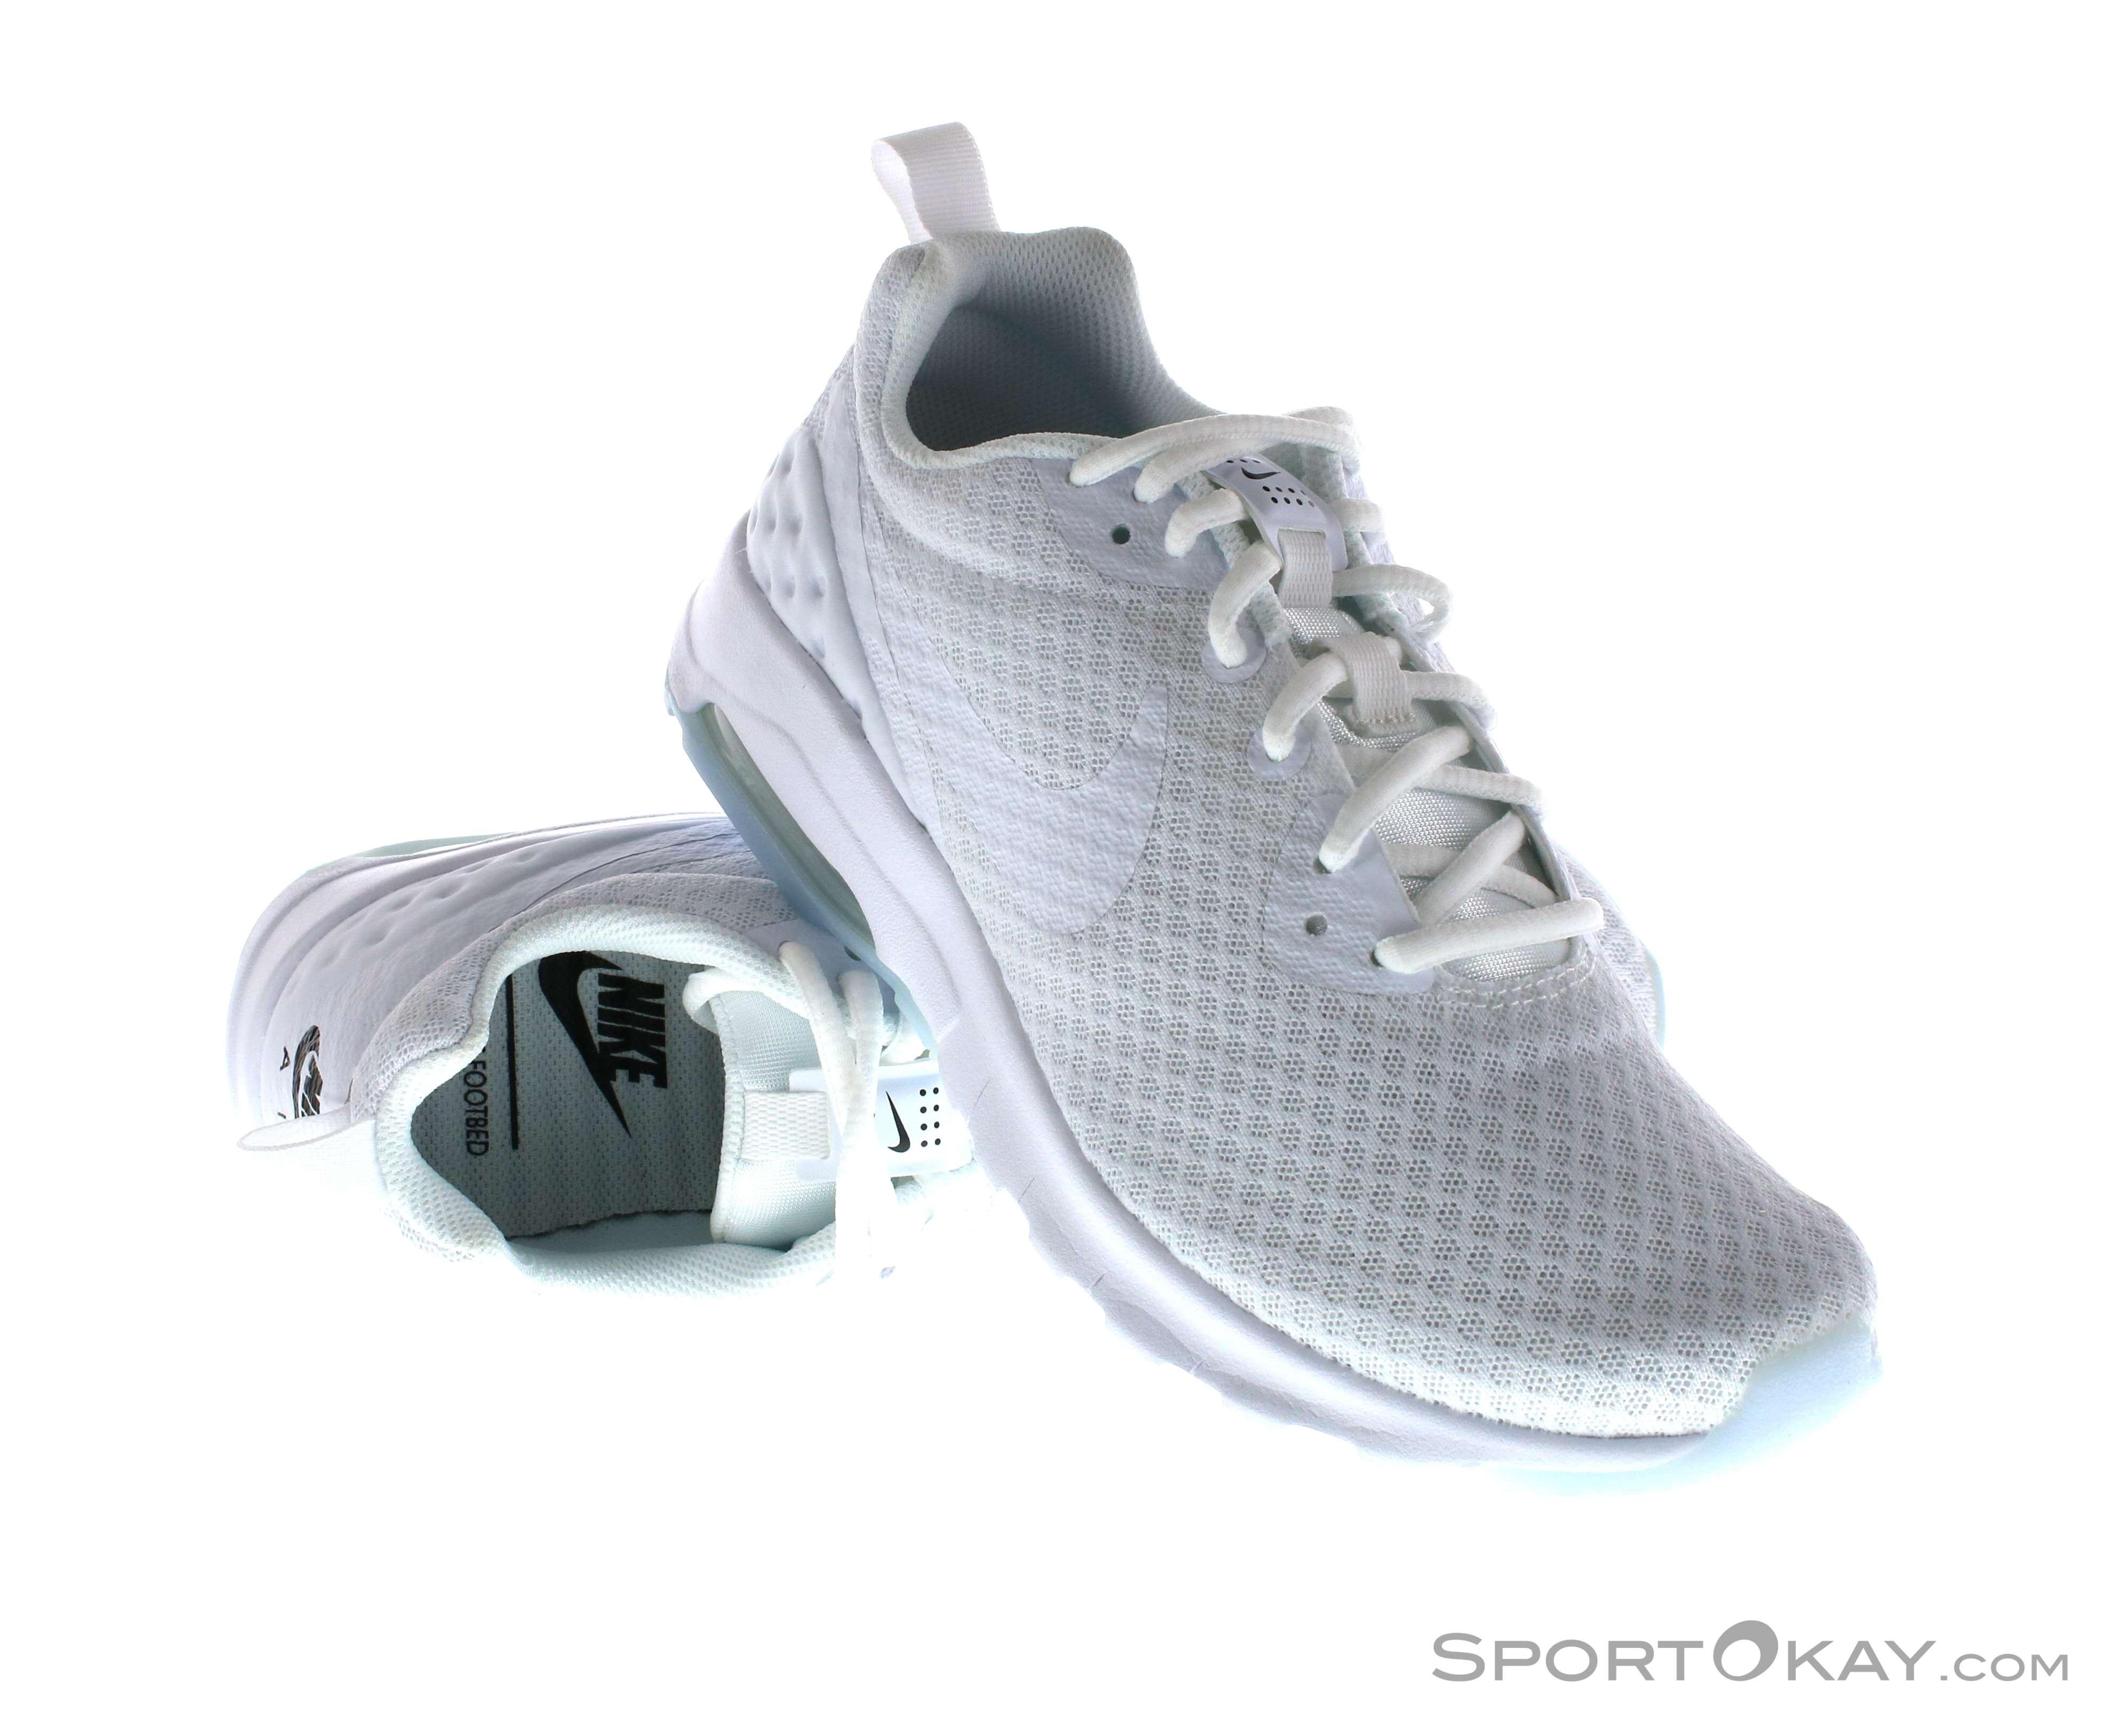 939e8656d1 Nike Air Max Motion LW Mens Leisure Shoes - Leisure Shoes - Shoes ...